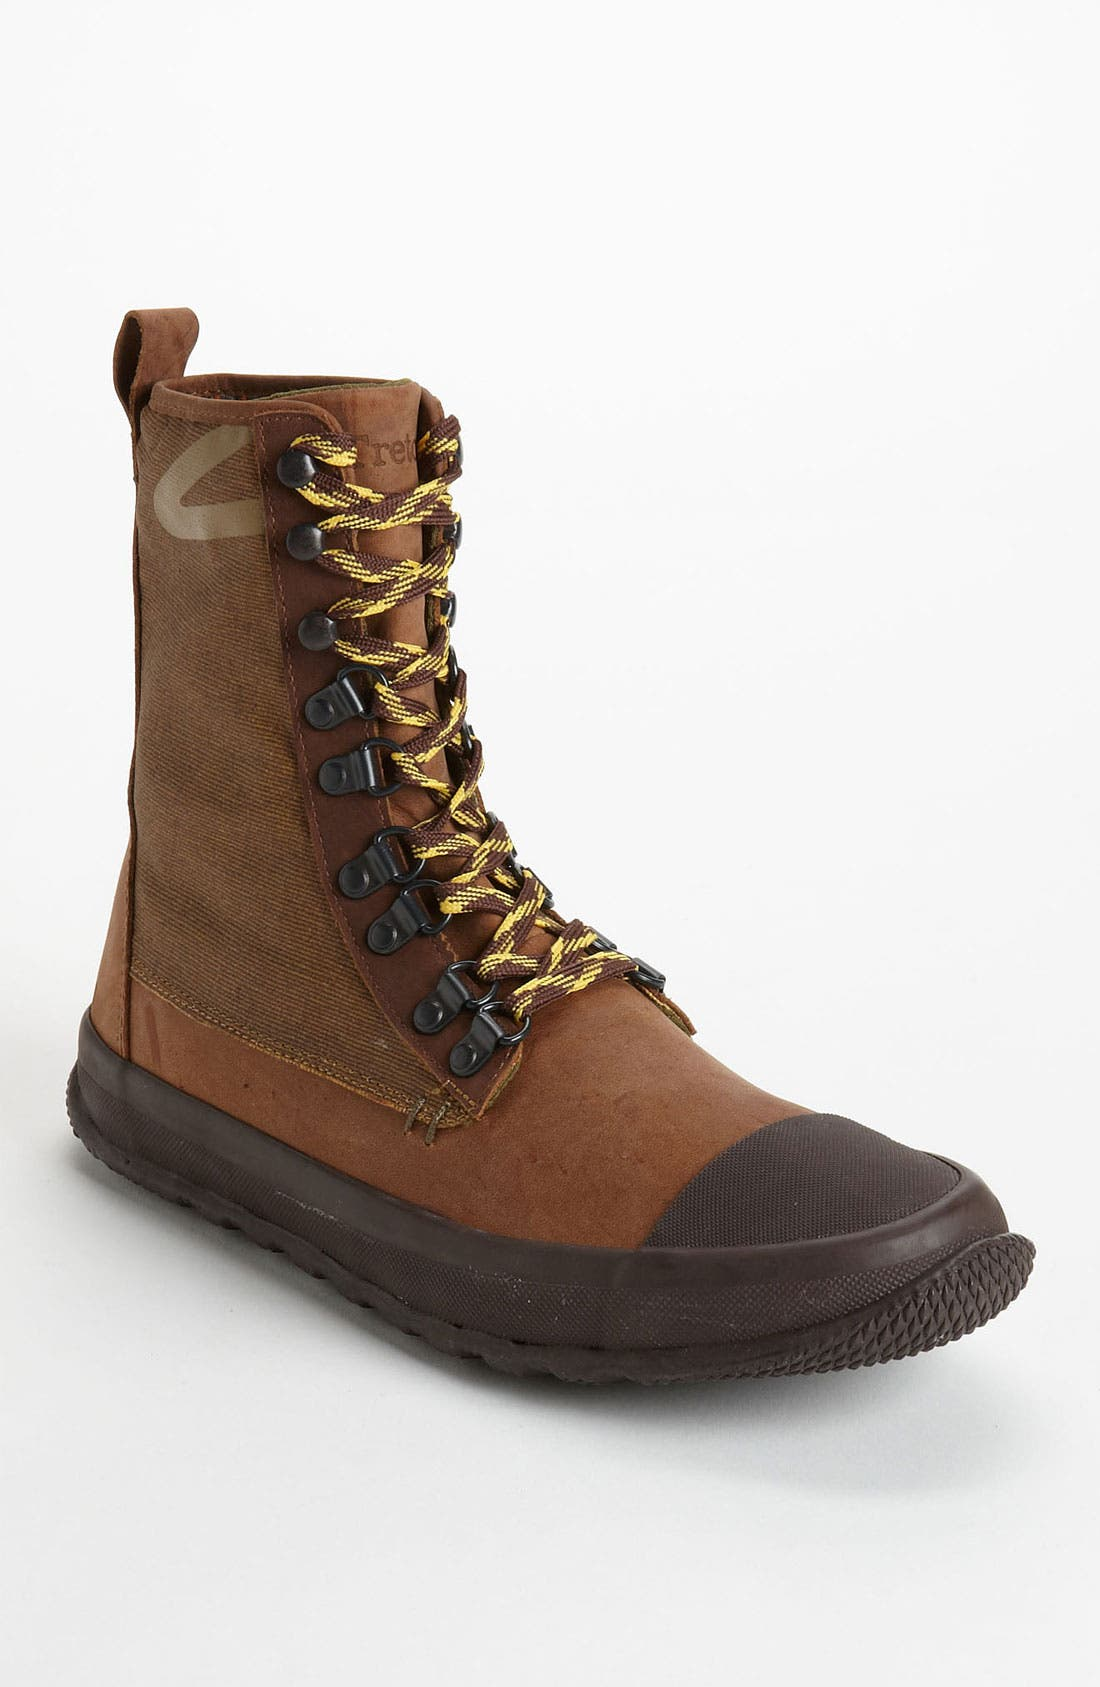 Alternate Image 1 Selected - Tretorn 'Klipporone' Boot